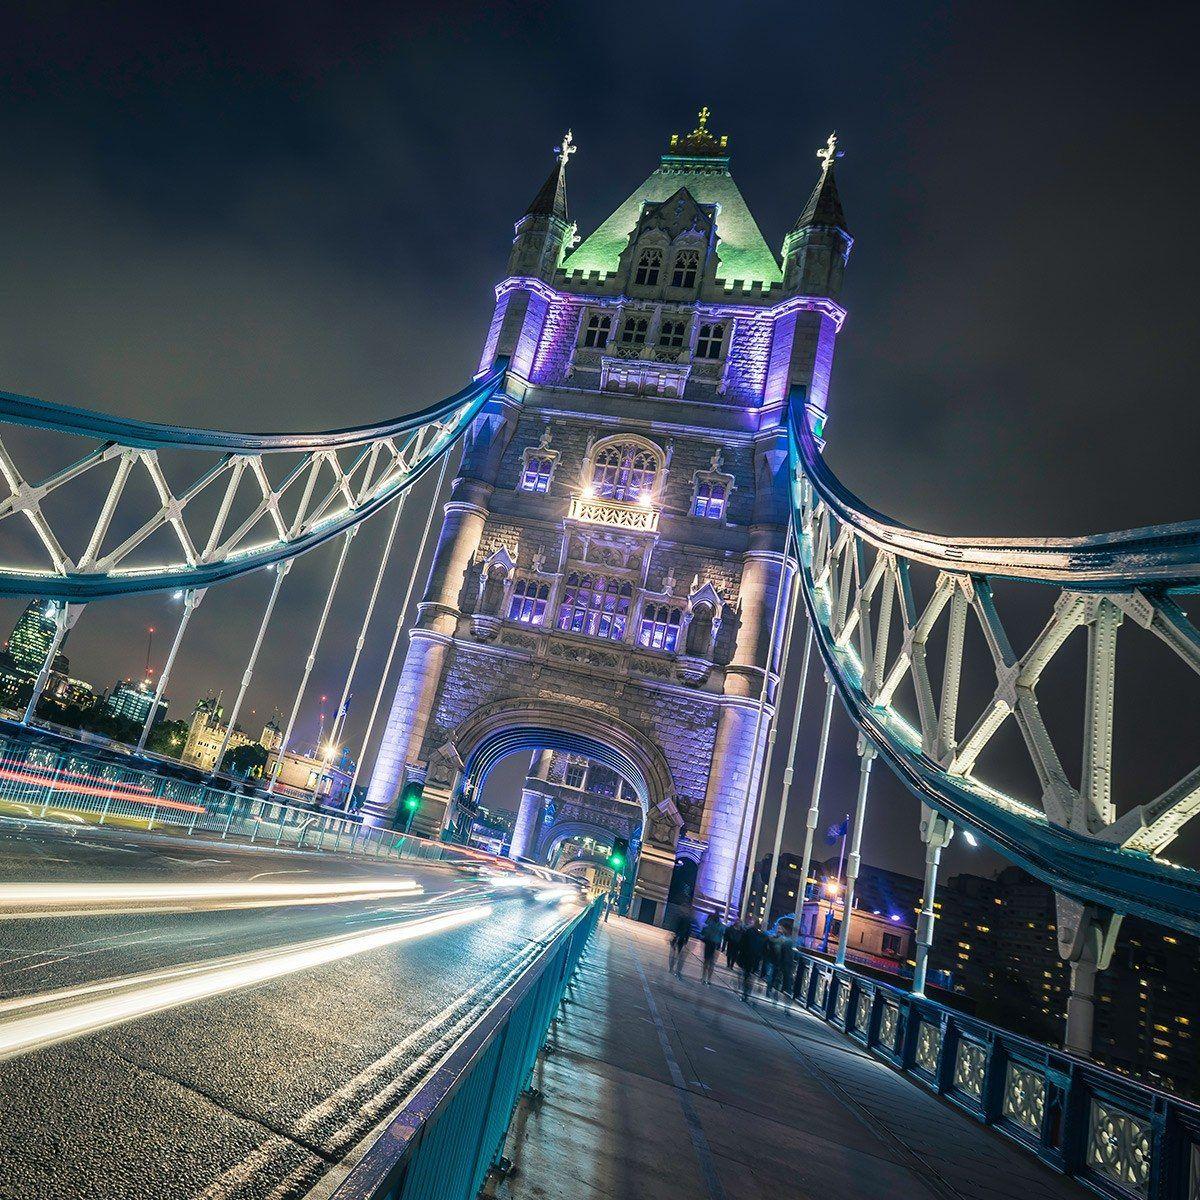 Luminar-Presets-Night-Photography-by-Presetpro.com